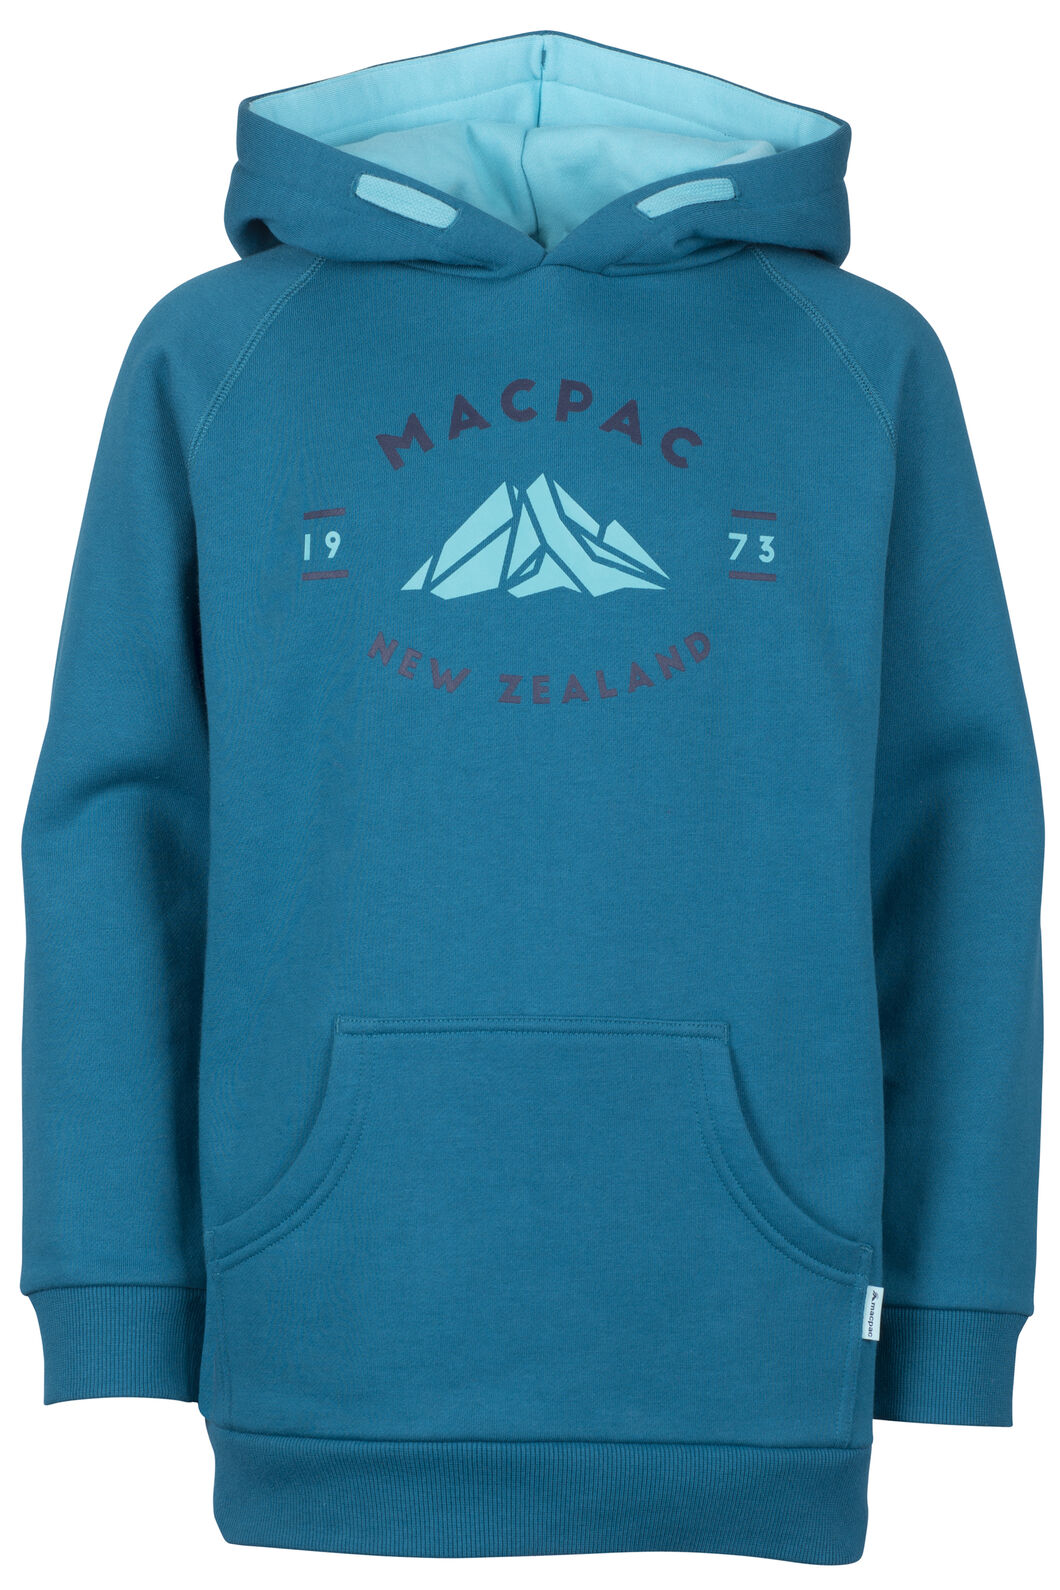 Macpac Organic Mountain Hoody - Kids', Ocean Depths, hi-res